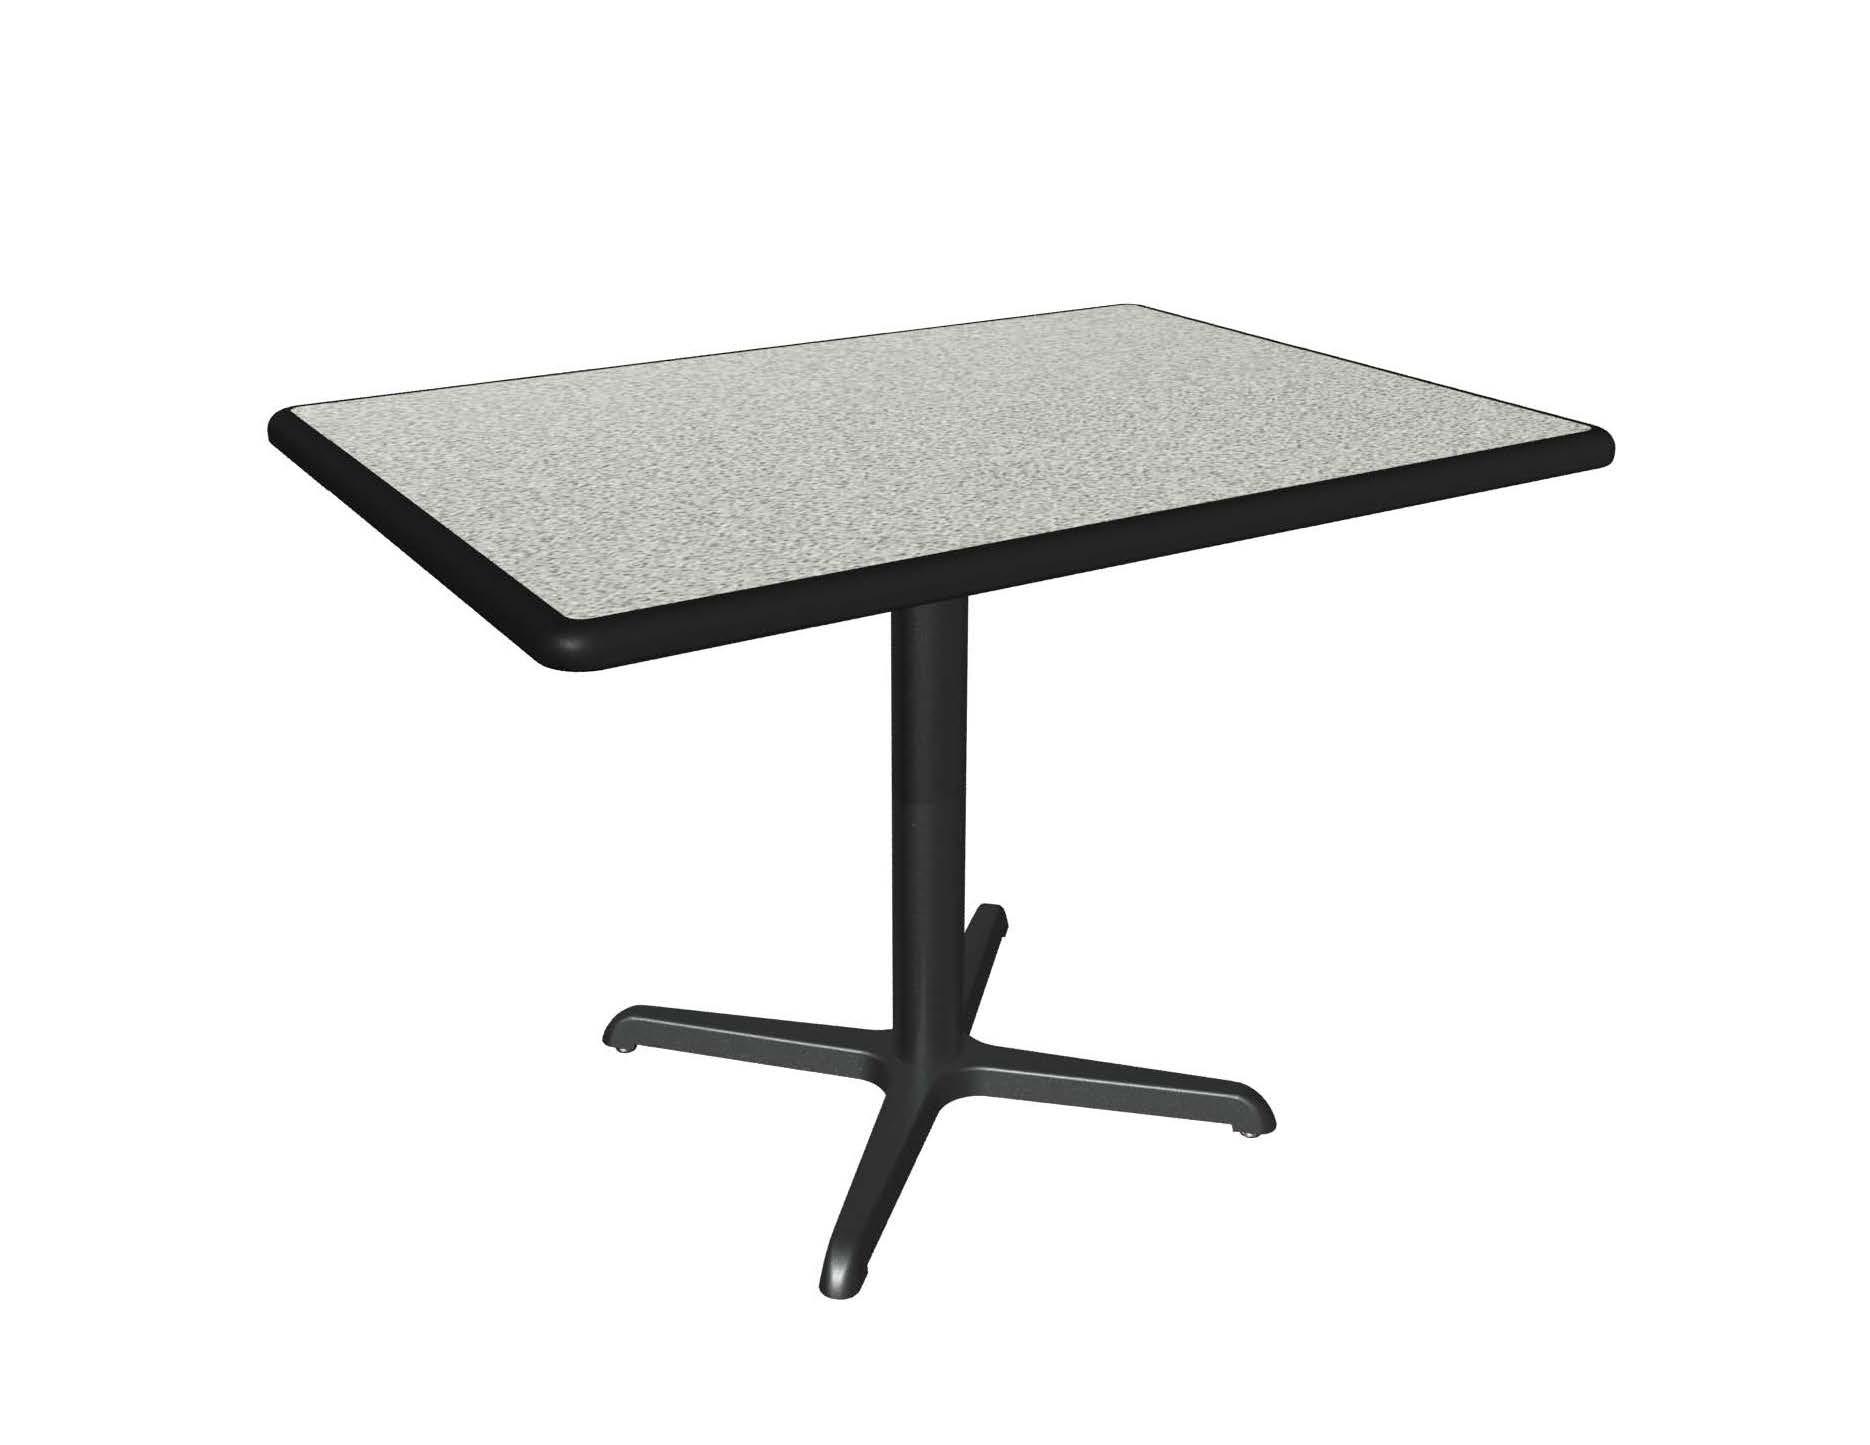 Dove Grey laminate table top, Black Dur-a-Edge